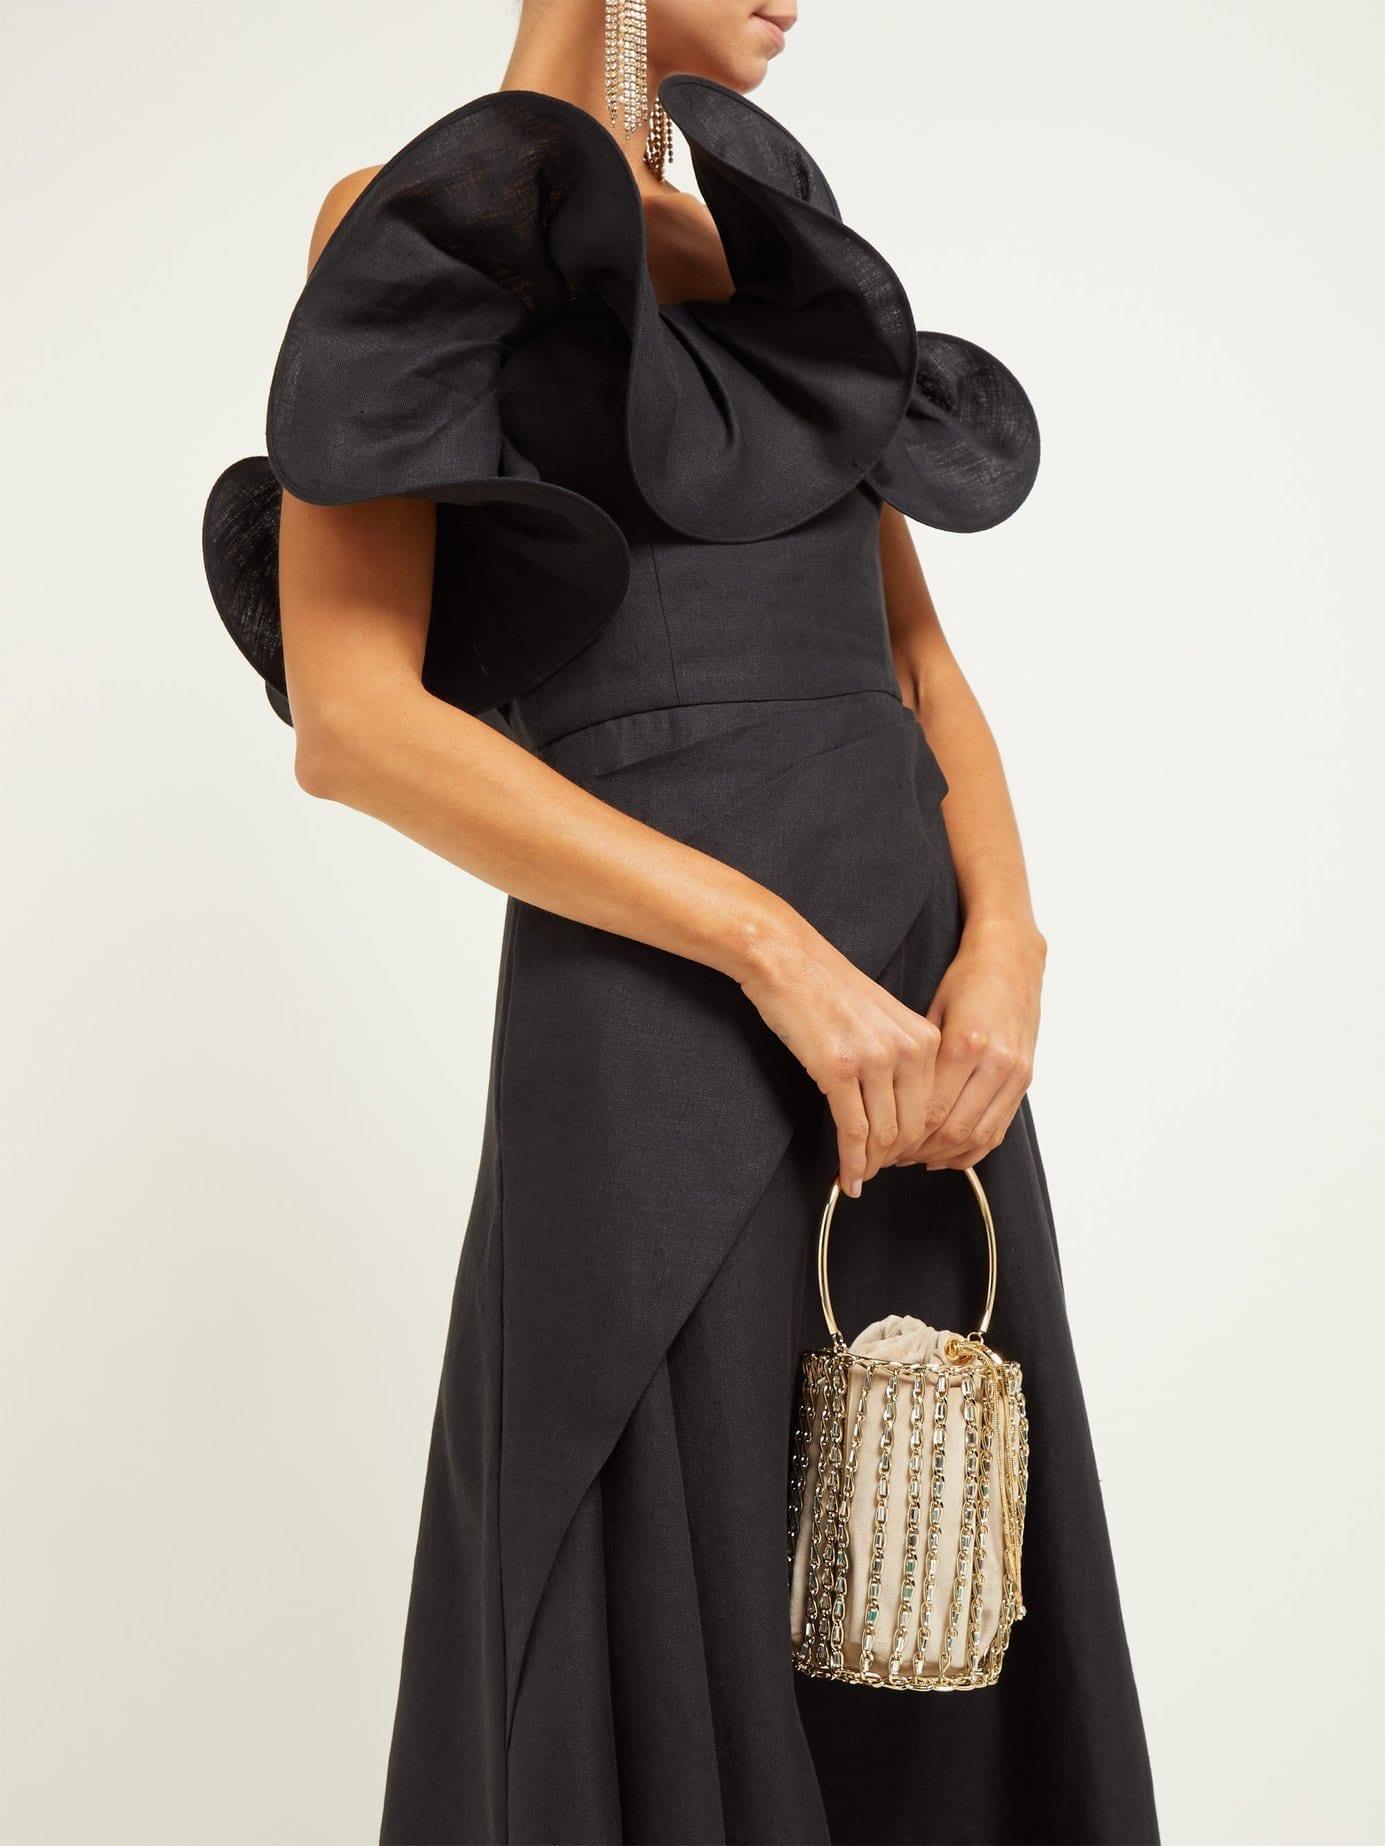 OSMAN Julie Ruffle-Bodice Linen Midi Black Dress